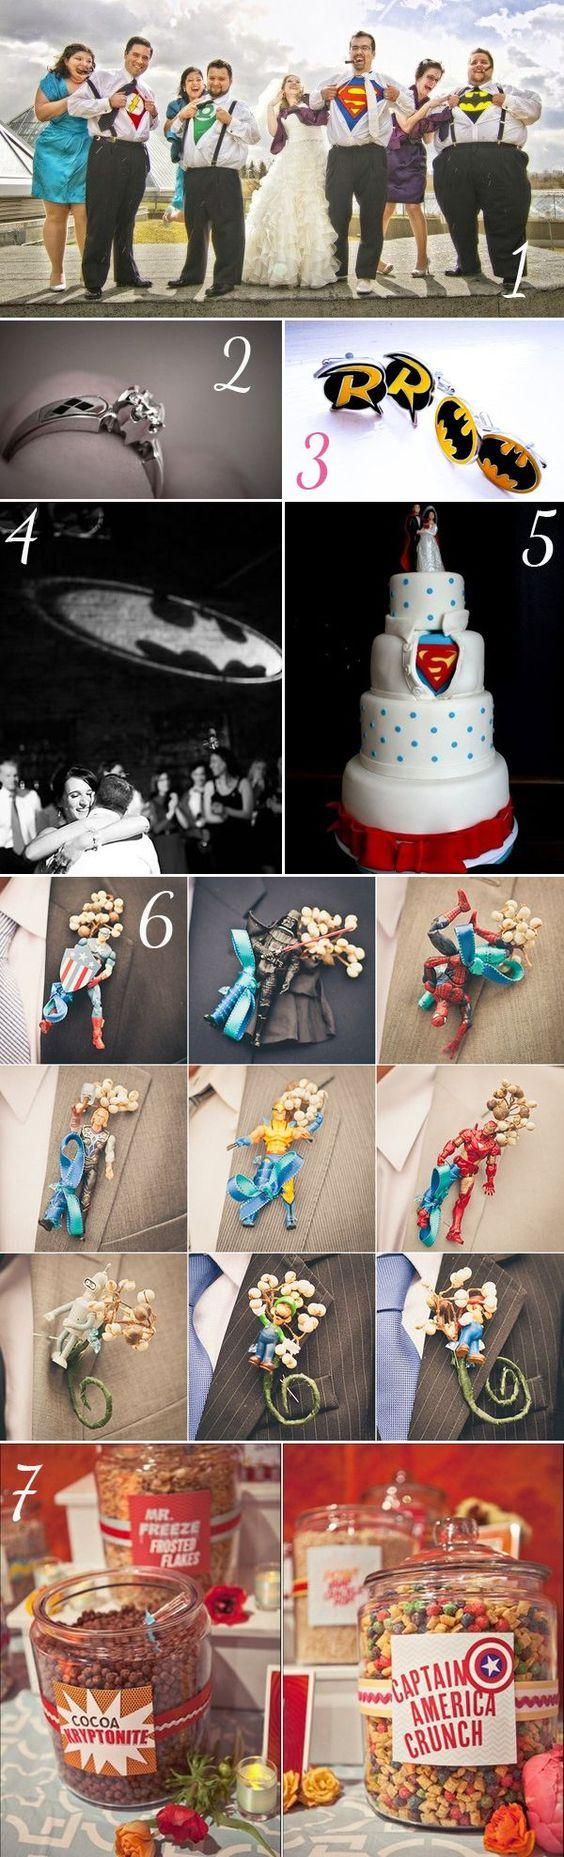 {Wedding Themes That'll Make You Smile} || The Pink Bride www.thepinkbride.com || #superhero #weddingtheme